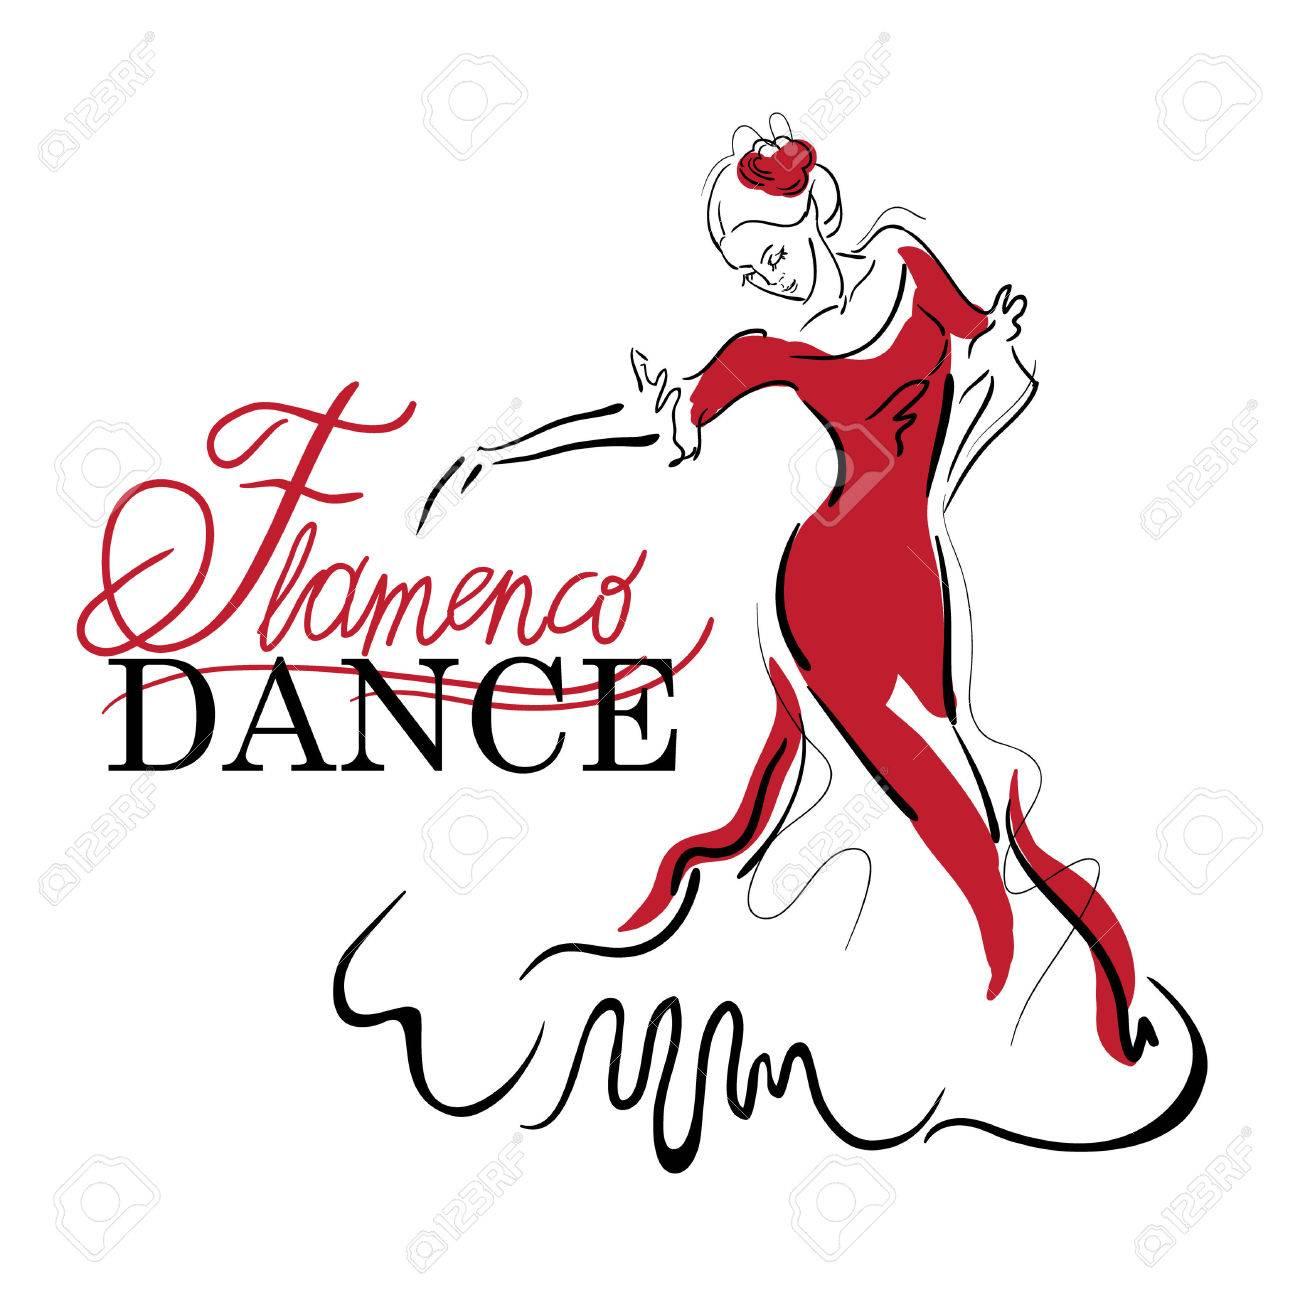 Flamenco dance elements. Dancer figure sketch. Flamenco Dance inscription. - 44059476